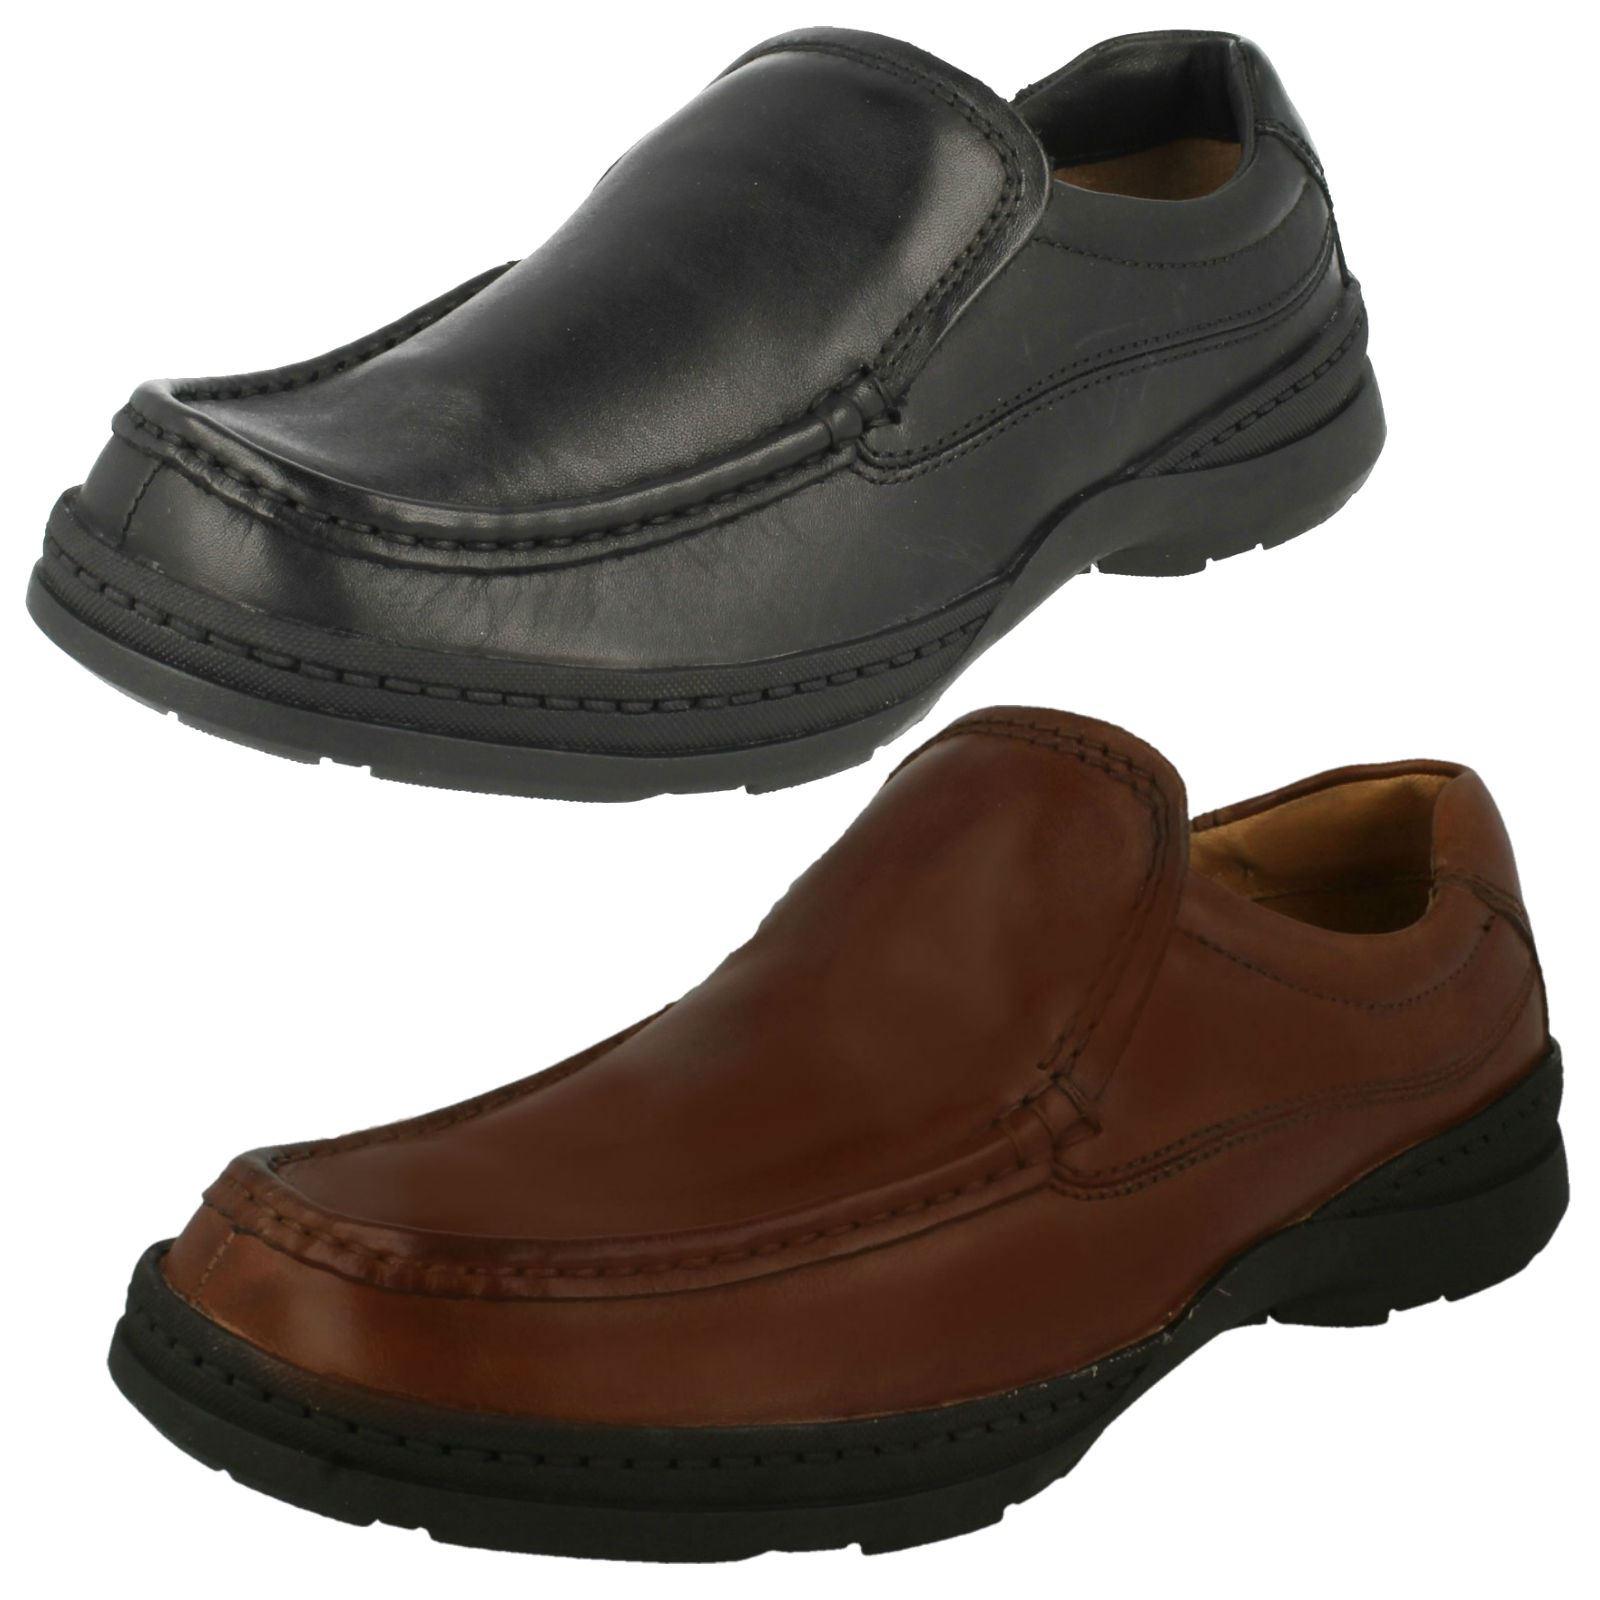 Mens Clarks Slip On Shoes Line Free | eBay